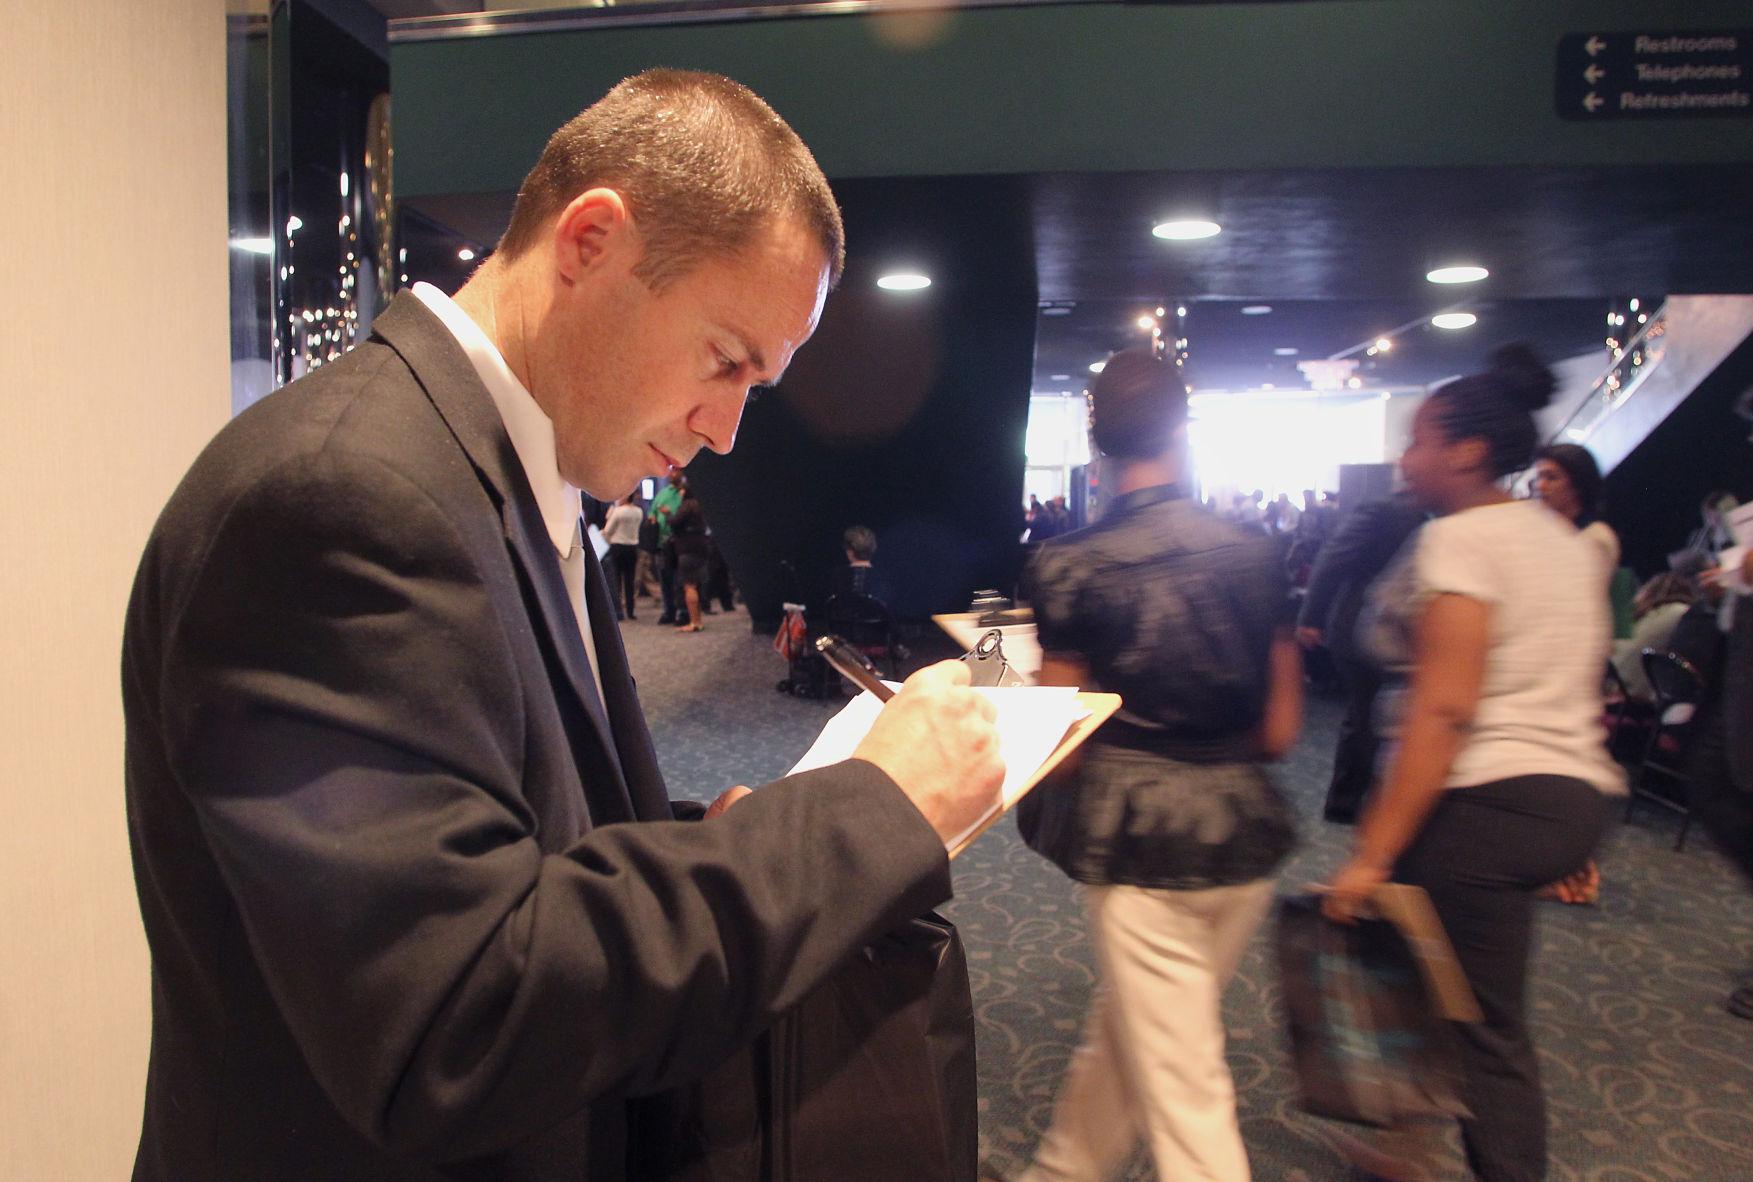 Job Fair Offers Hope To 2 500 Job Seekers News Bakersfield Com